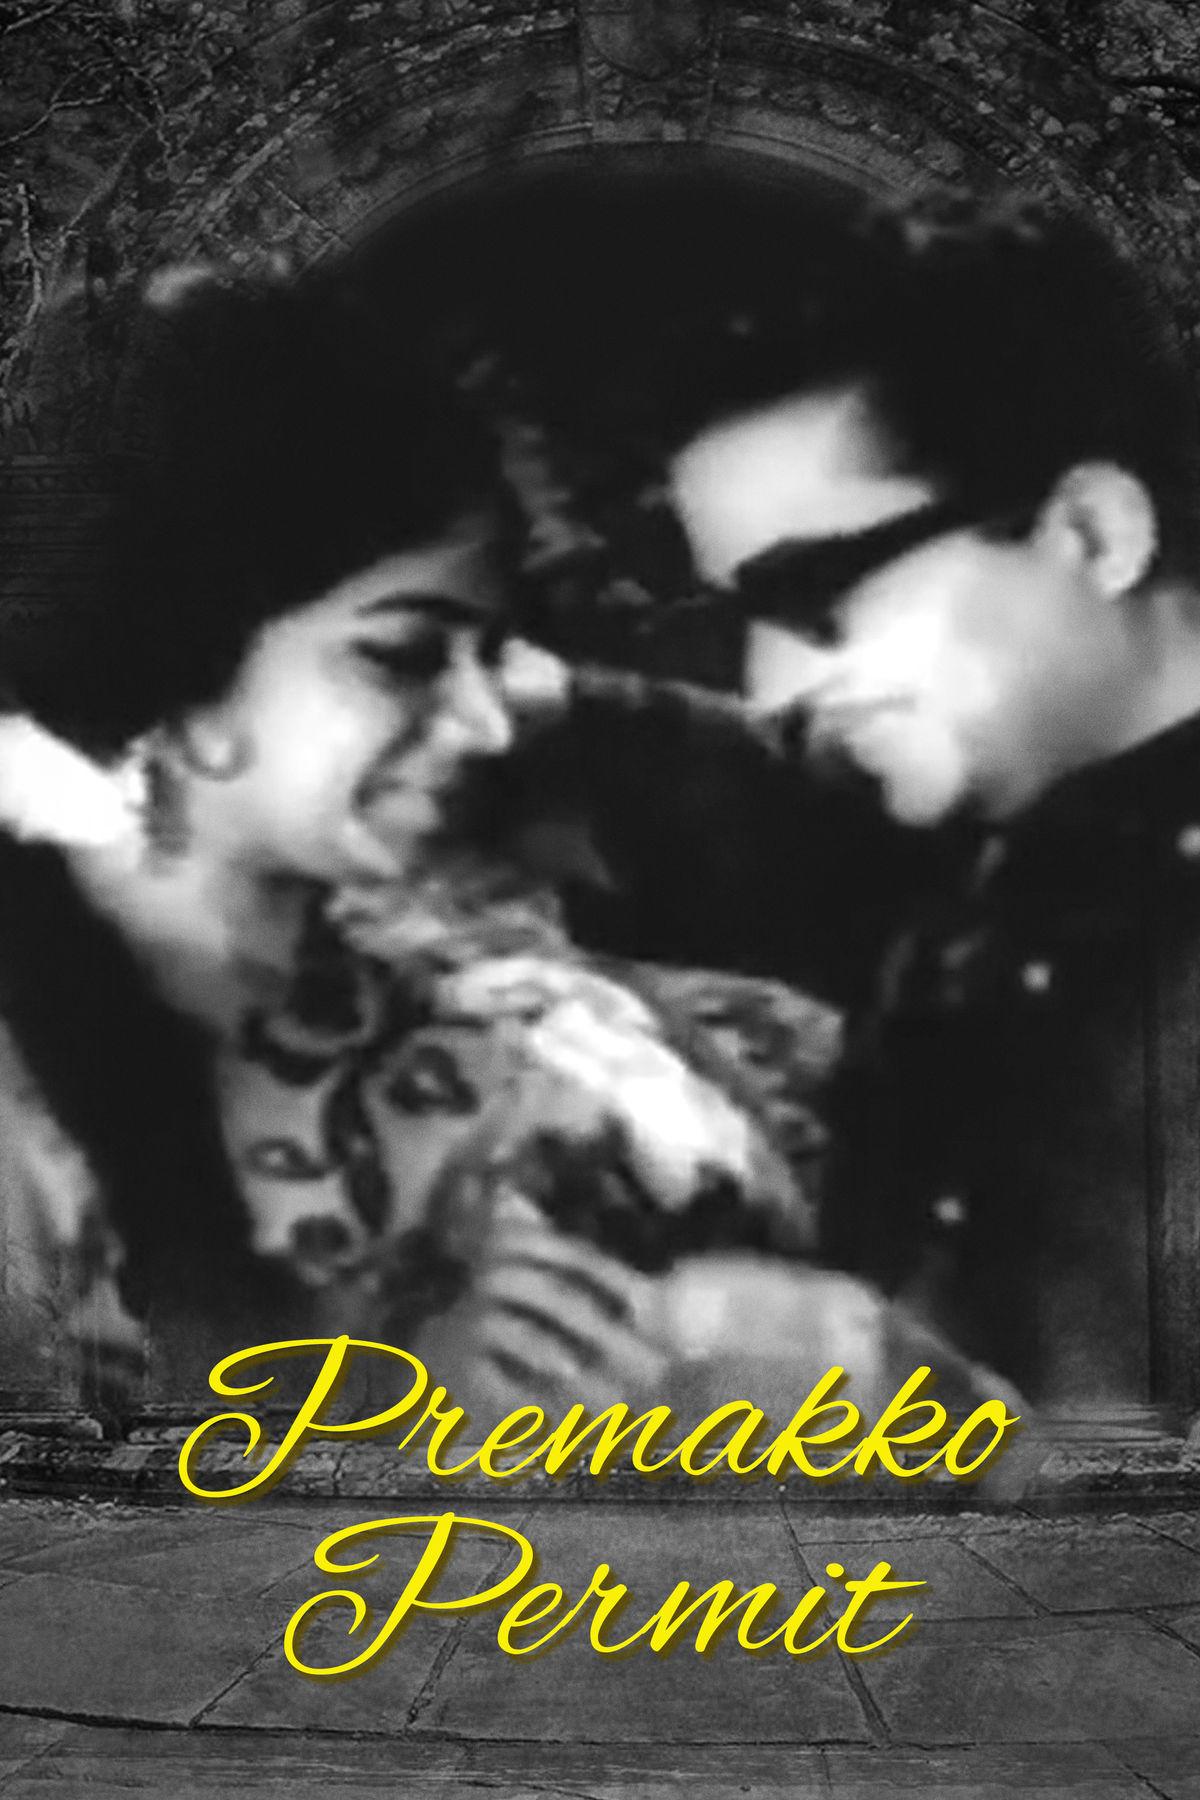 Premakko Permit